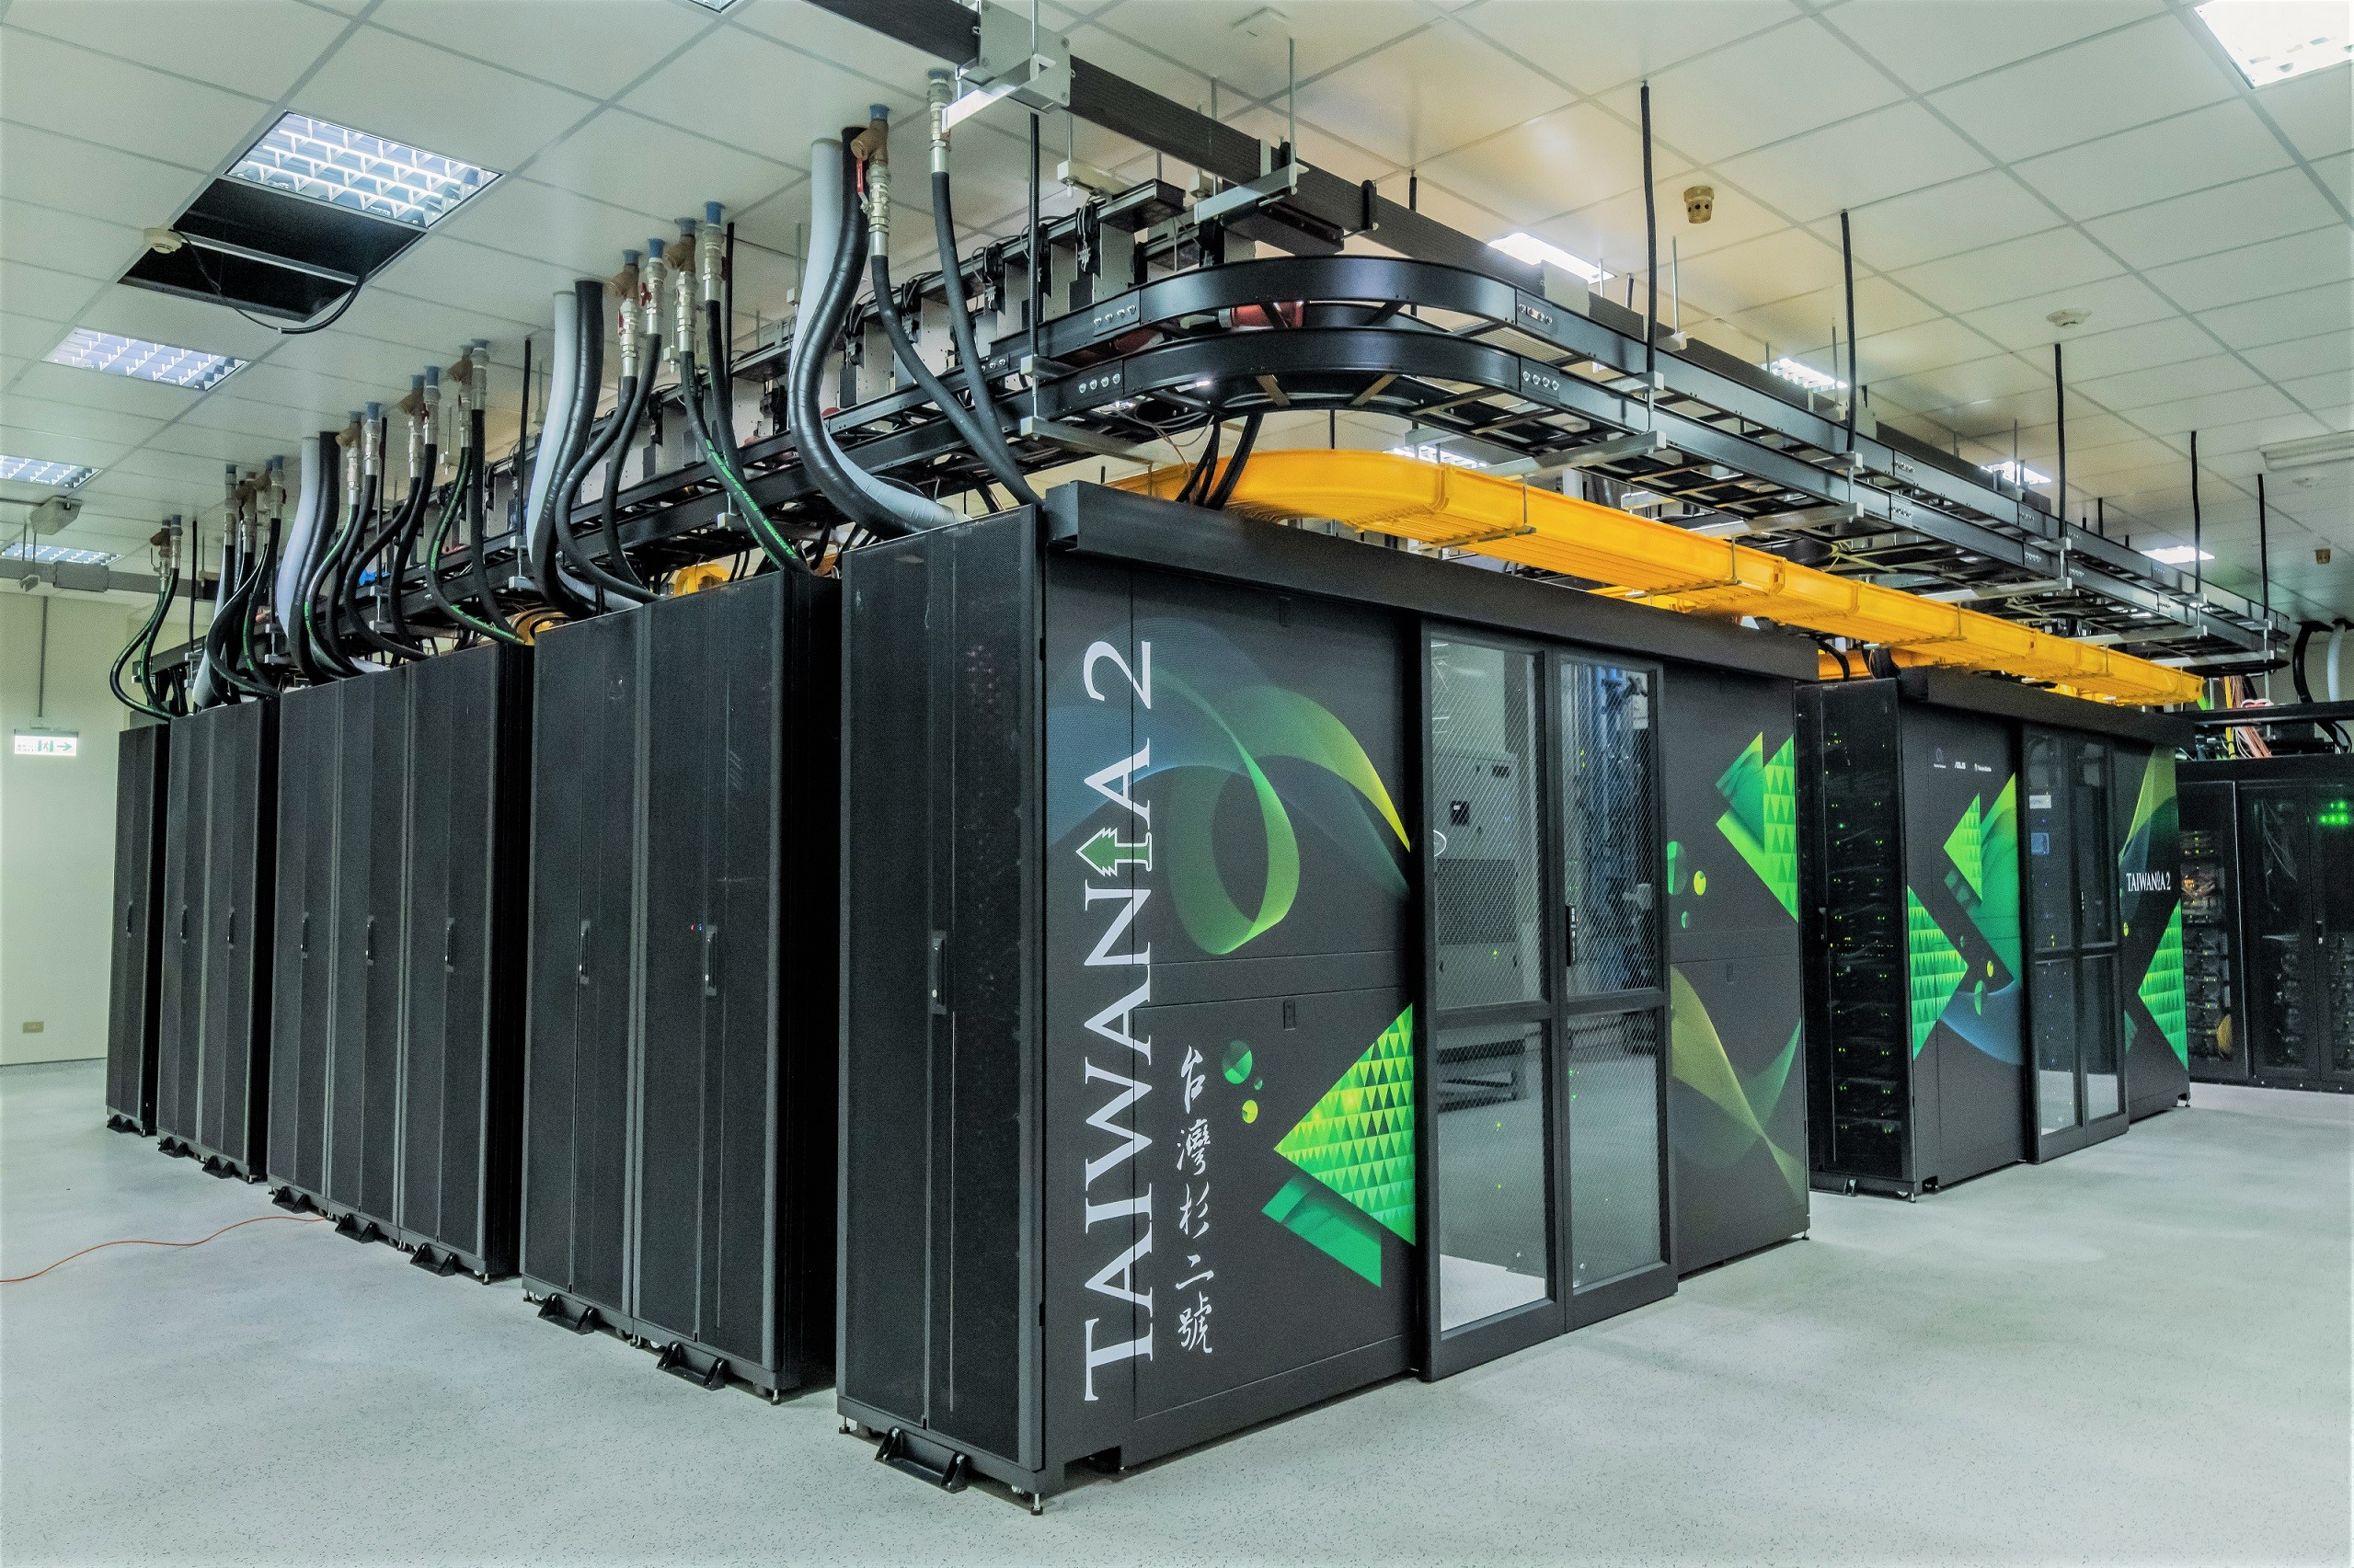 Taiwania 2 Supercomputer mit QCT